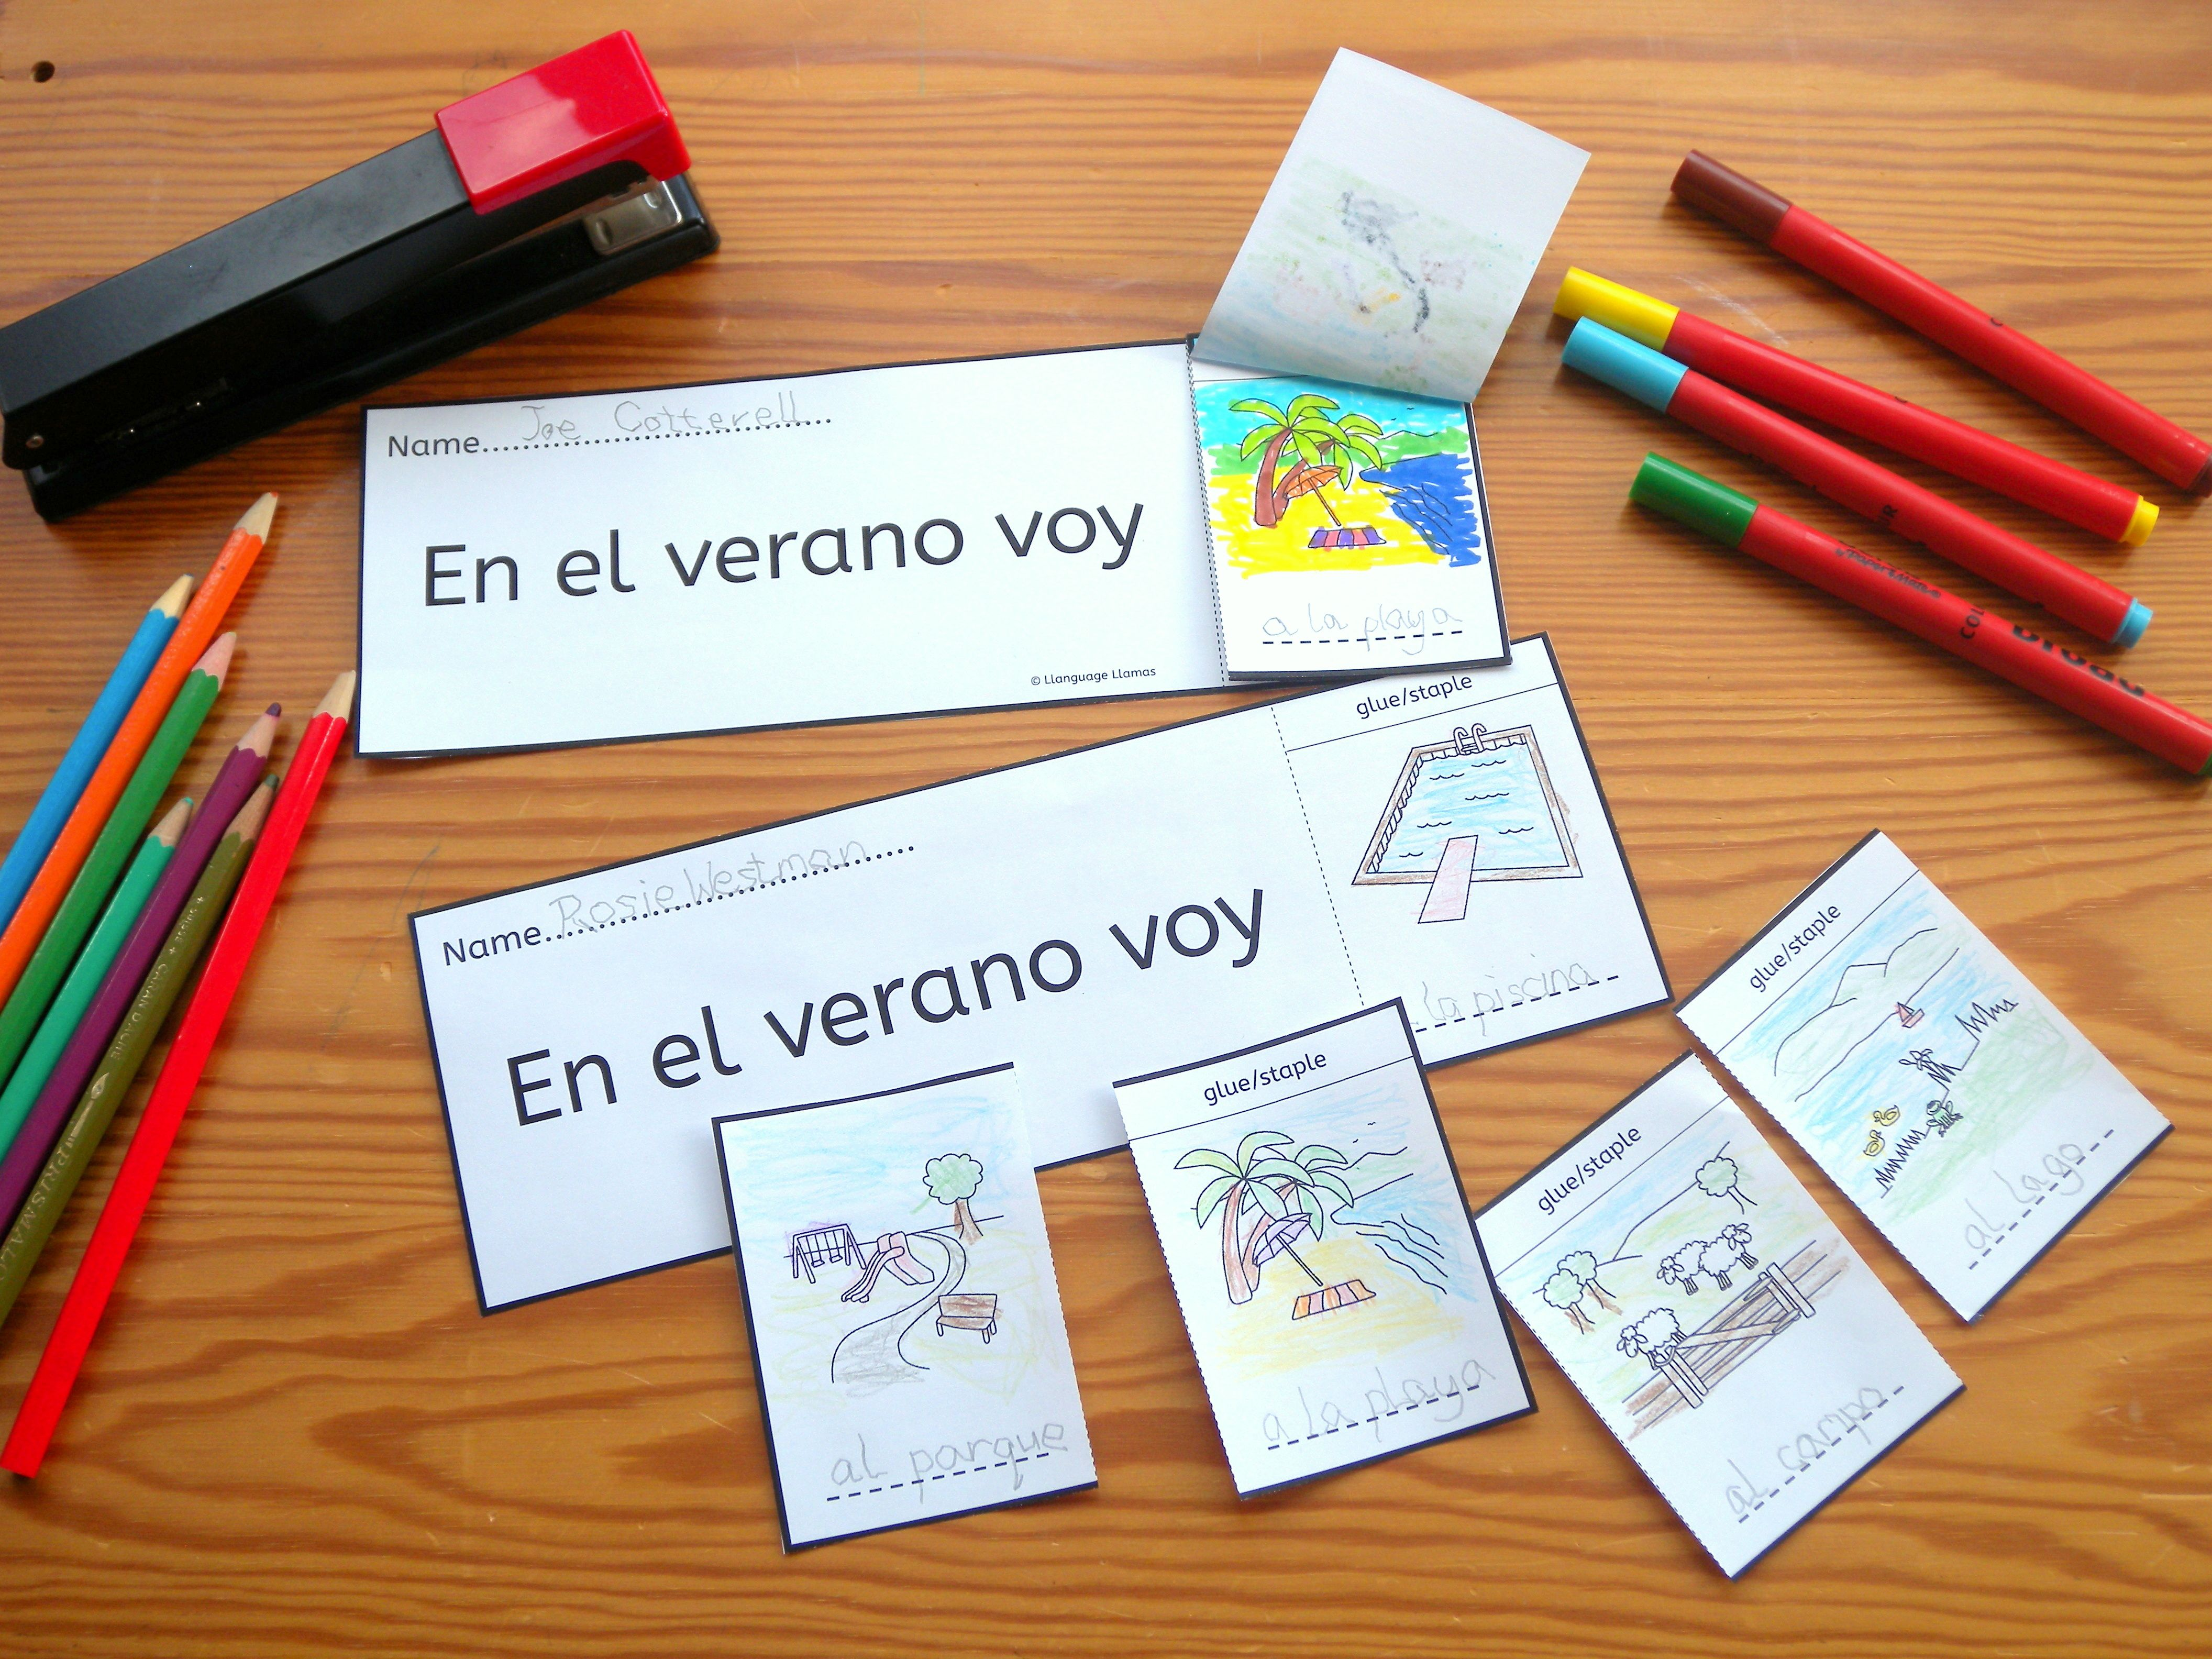 Having Fun With Llanguage Llamas Spanish Summer Flip Books